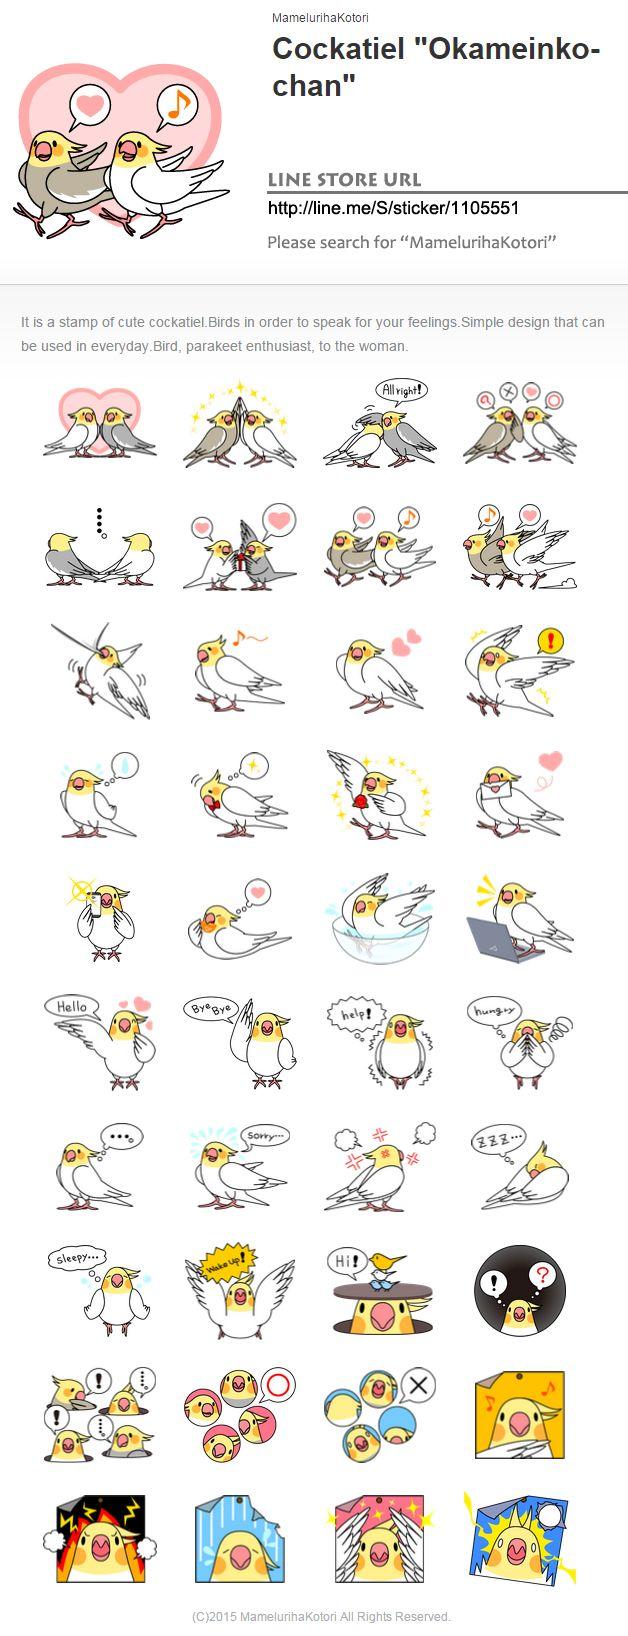 Pin by Gabbie Glanton on Art | Cockatiel, Parrot, Pet birds